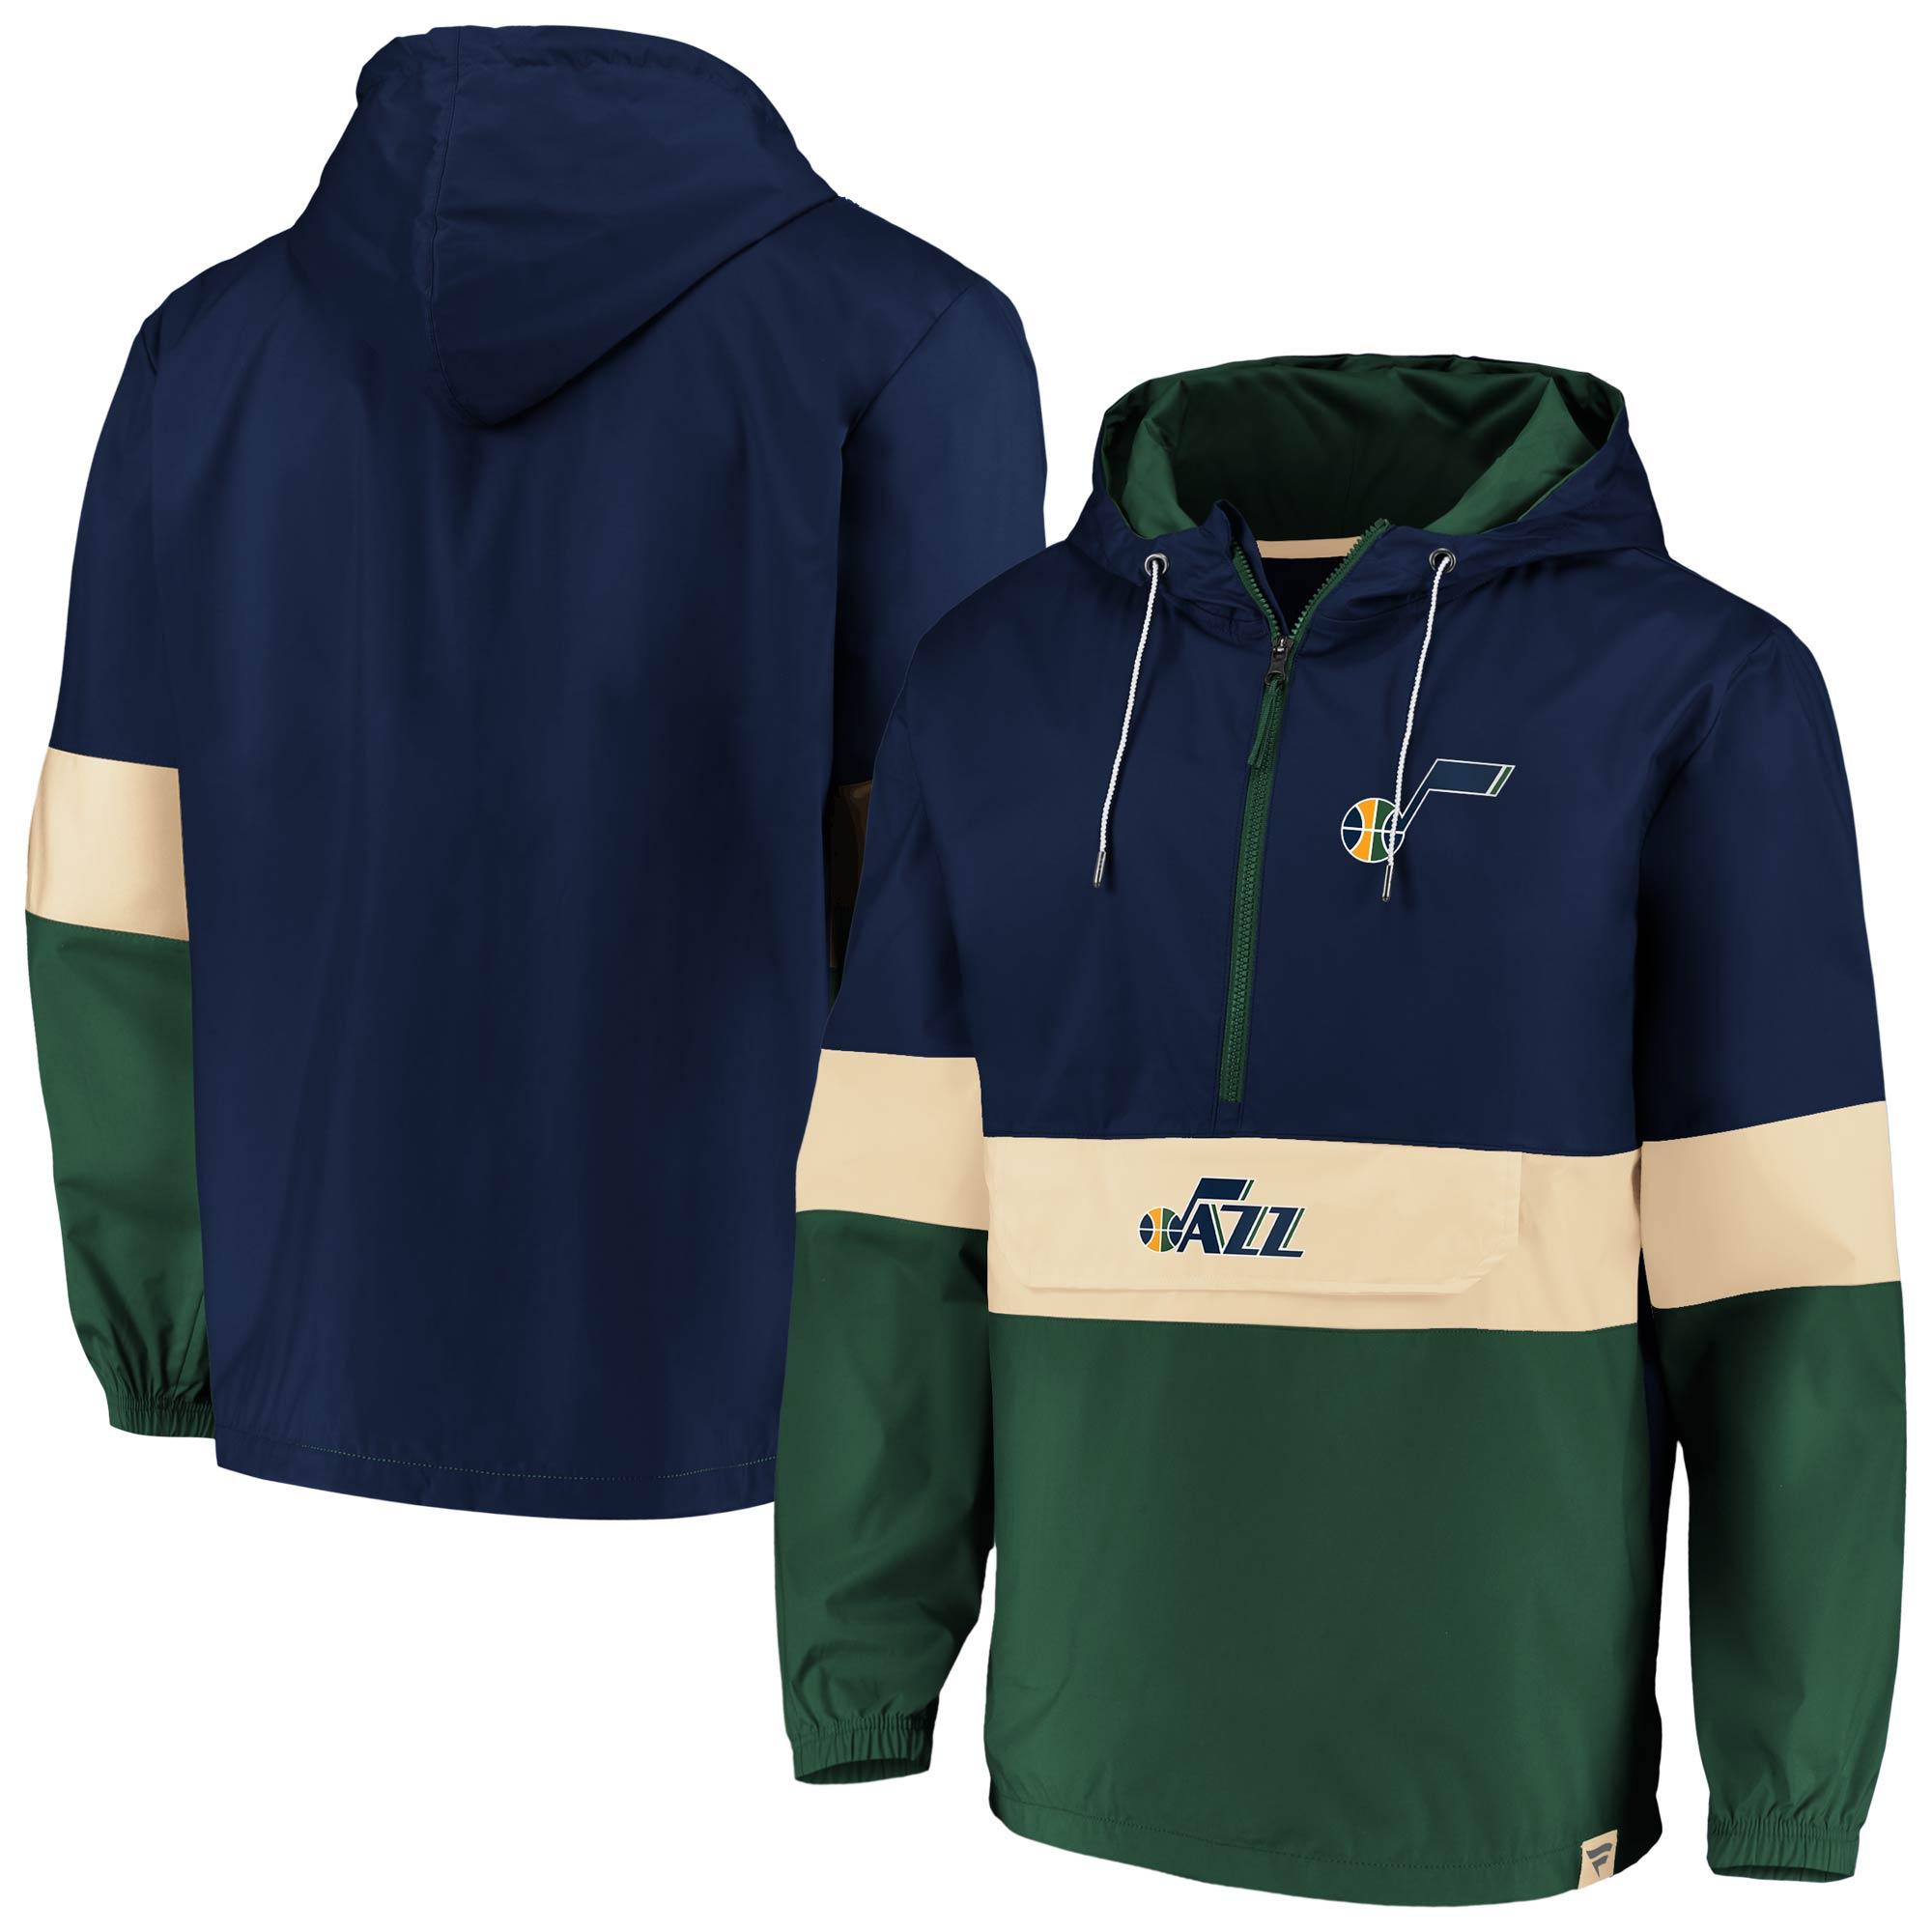 Utah Jazz Fanatics Branded True Classics Lead Blocker Anorak Hoodie Half-Zip Windbreaker Jacket - Navy/Green